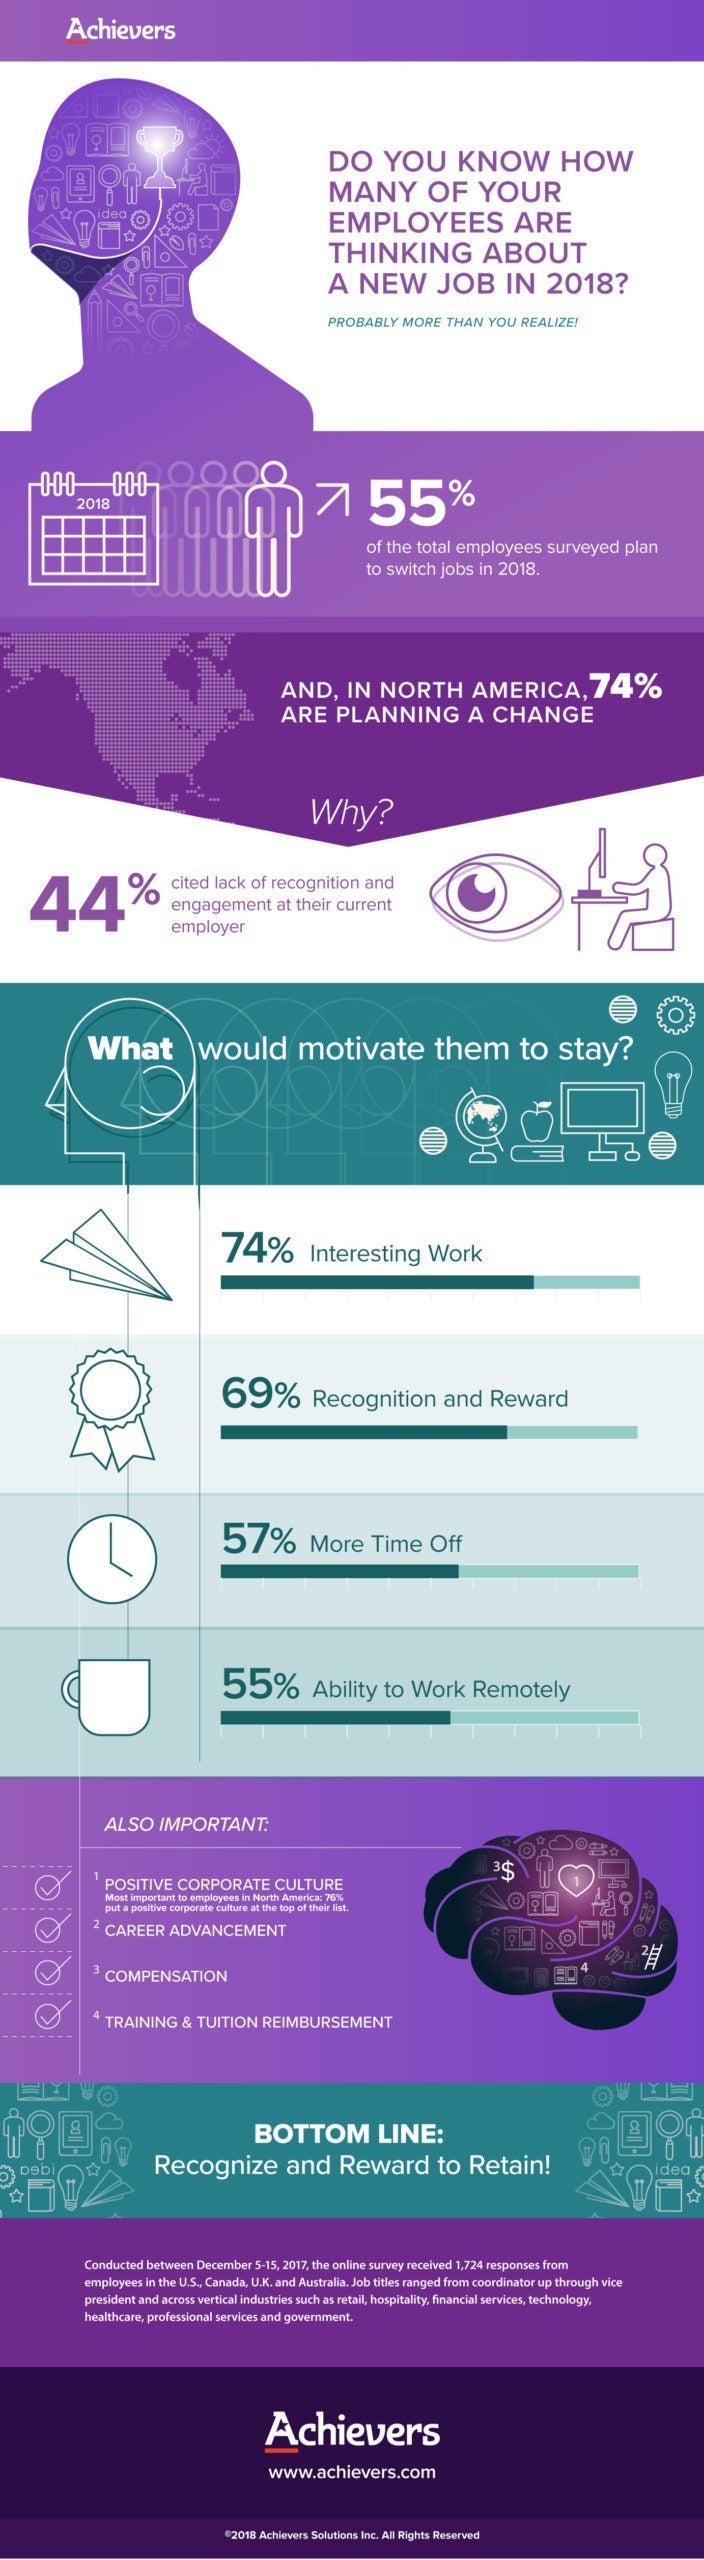 img-responsive img-infographic